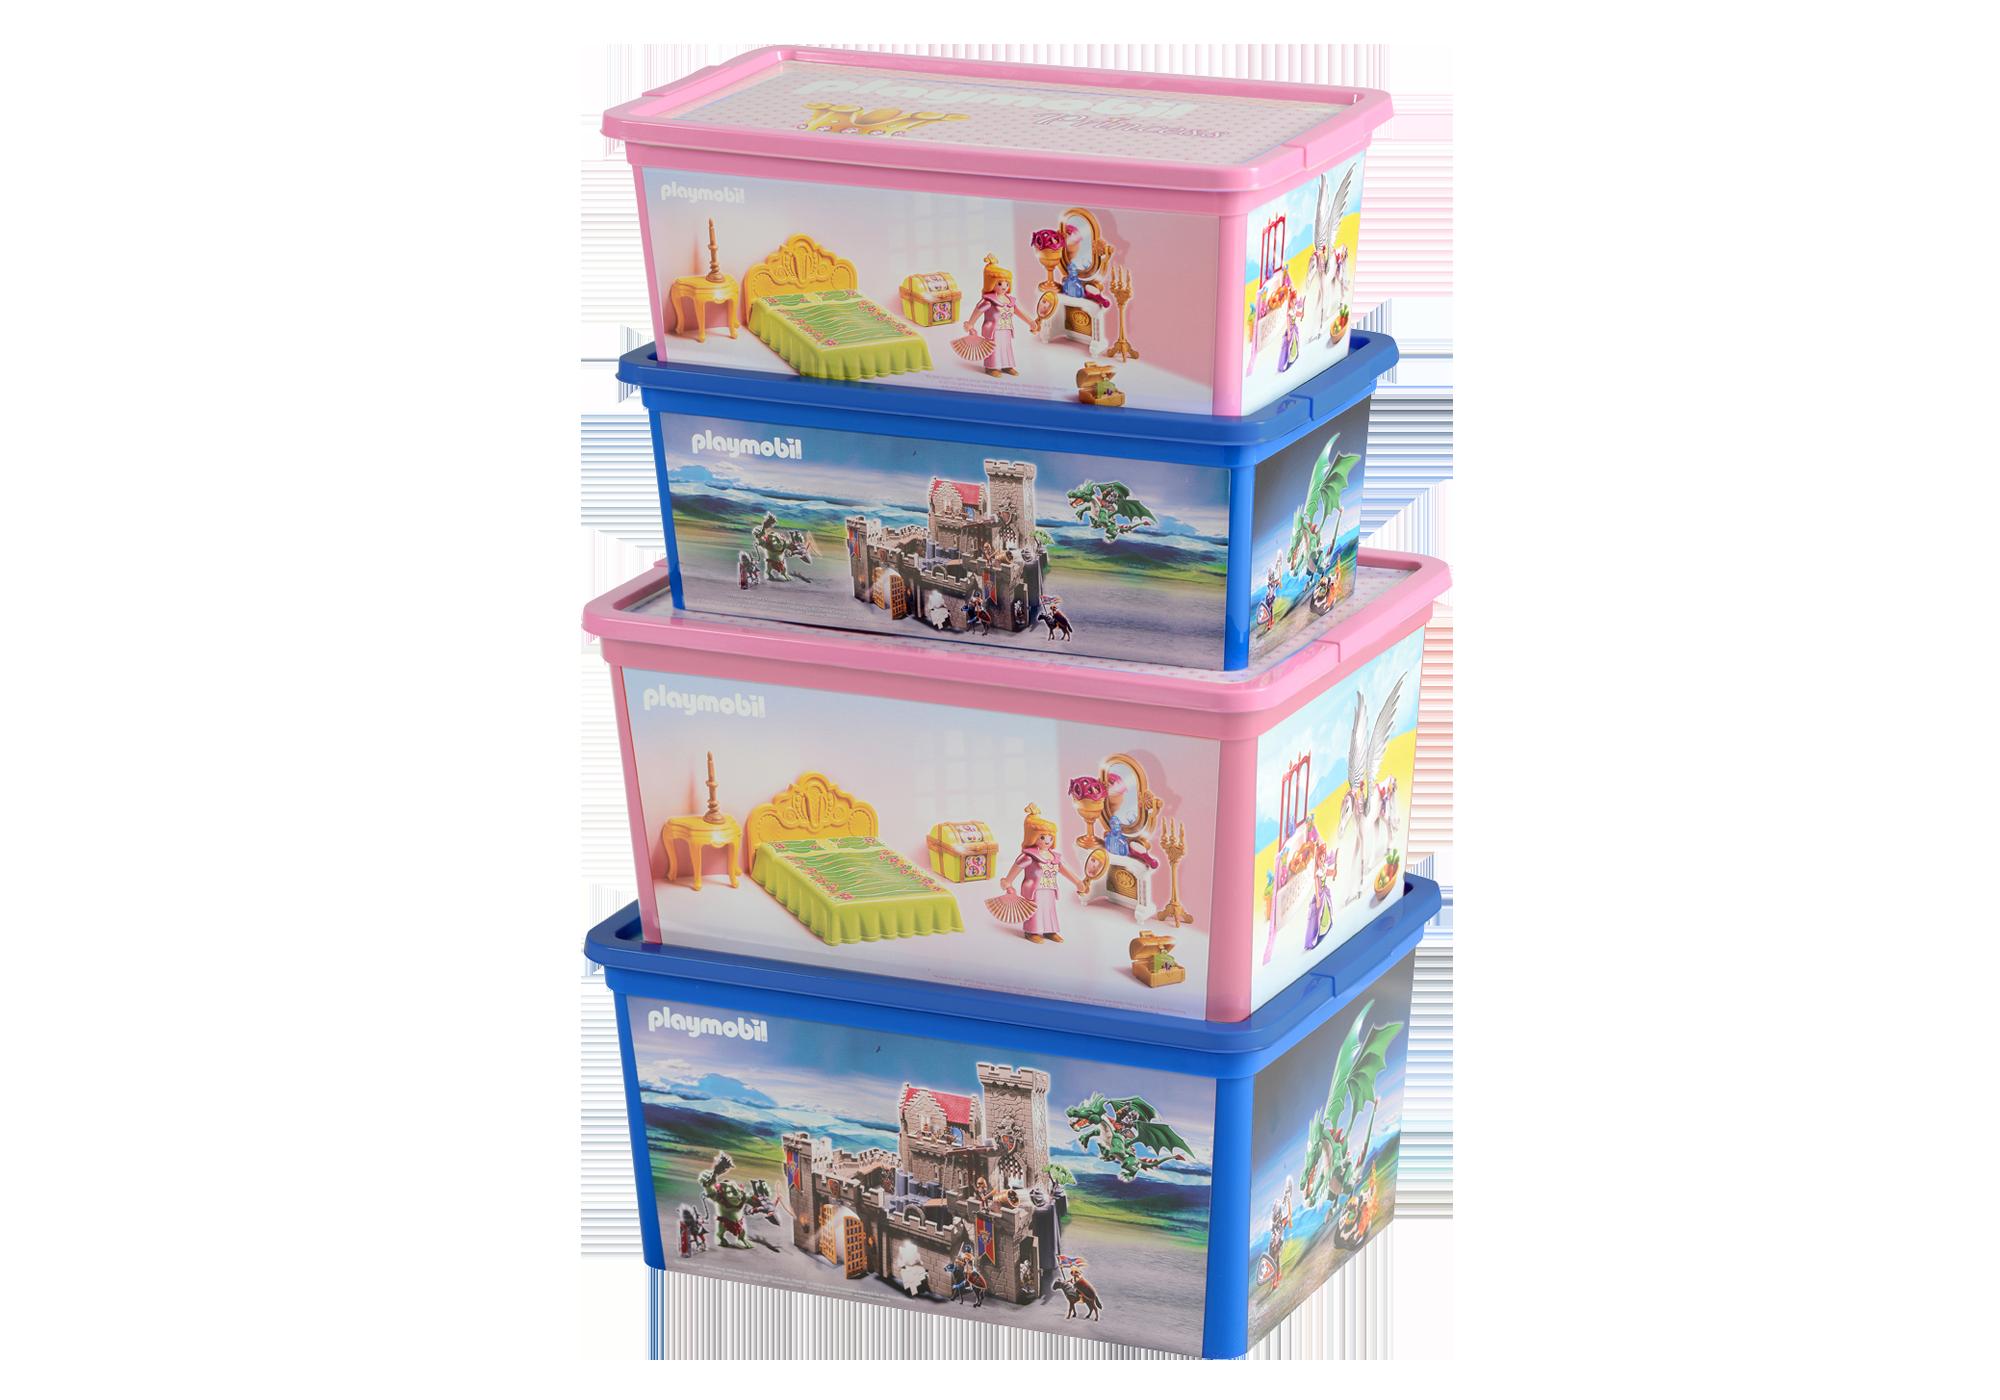 http://media.playmobil.com/i/playmobil/80489_product_extra1/6L RITTER Aufbewahrungsbox